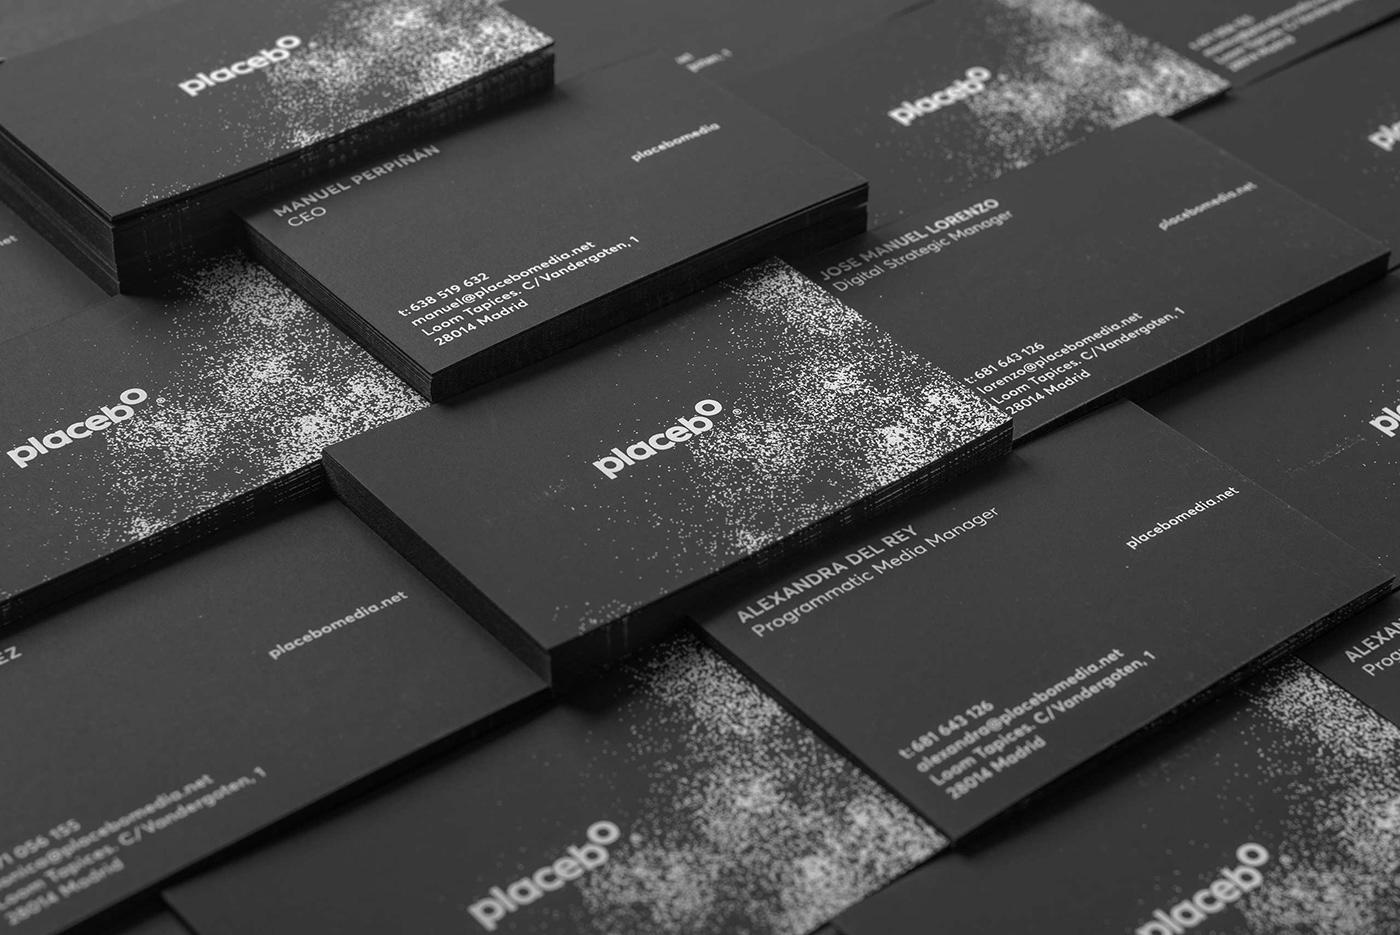 Marca Placebo: tarjetas